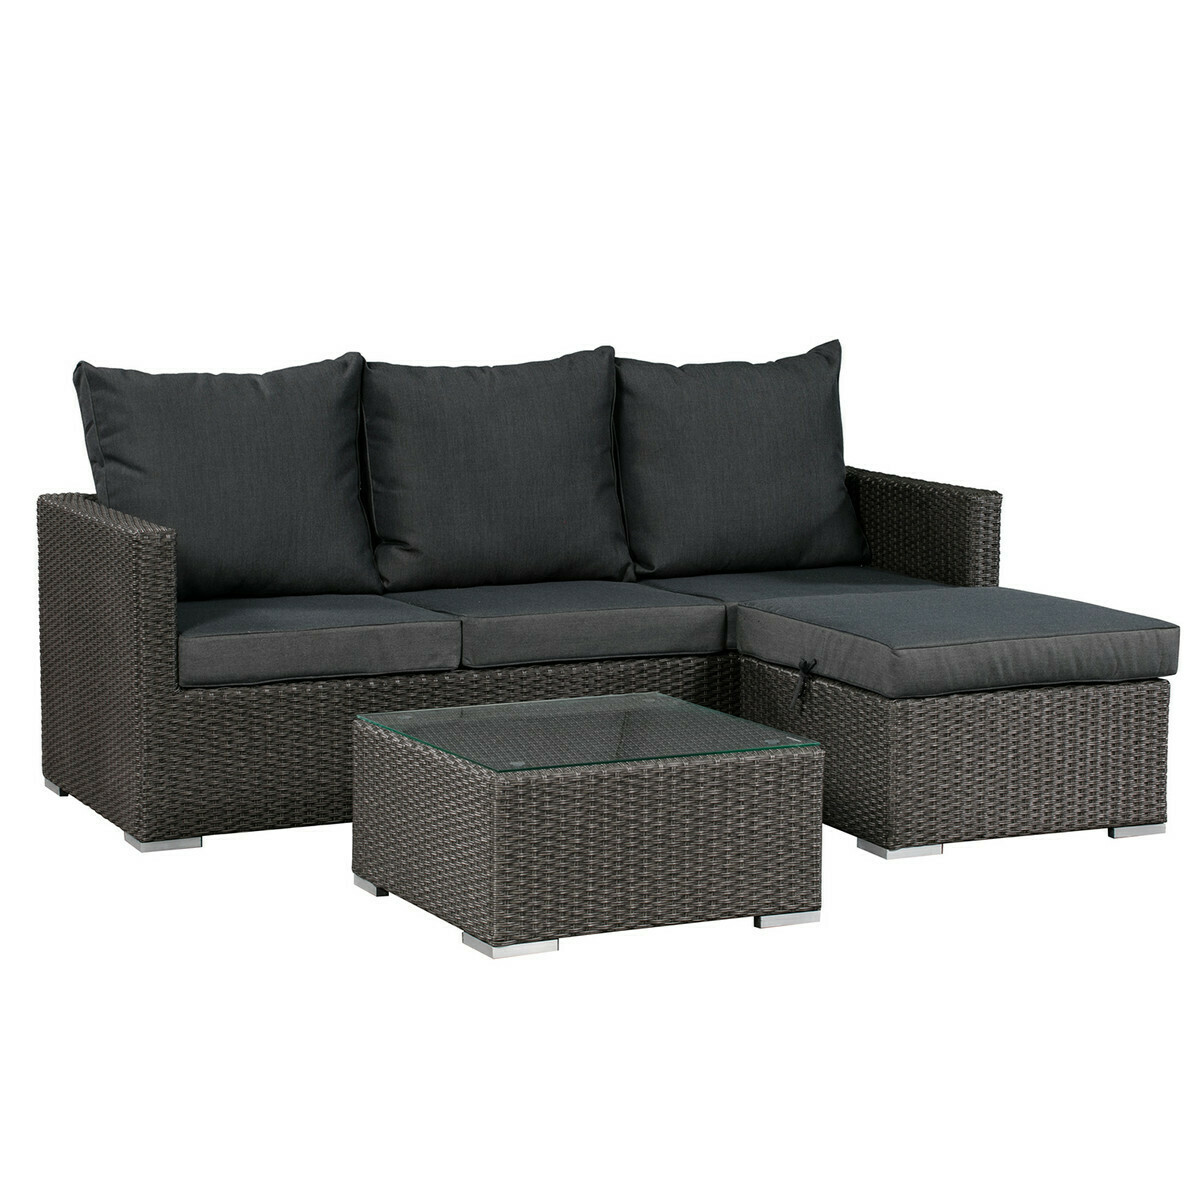 Evan - Sofa Set